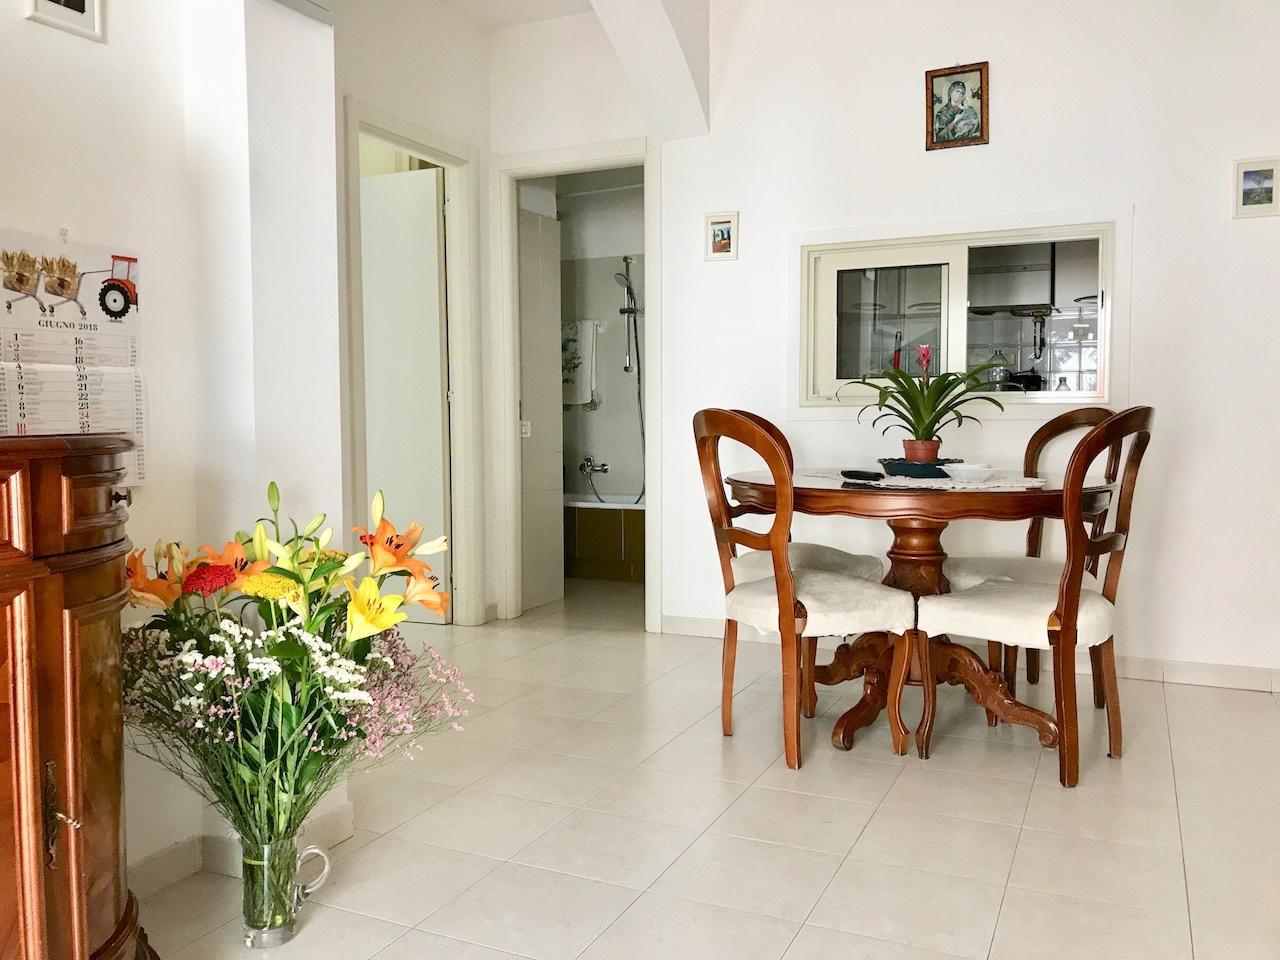 Appartamento in vendita, rif. LOG-207